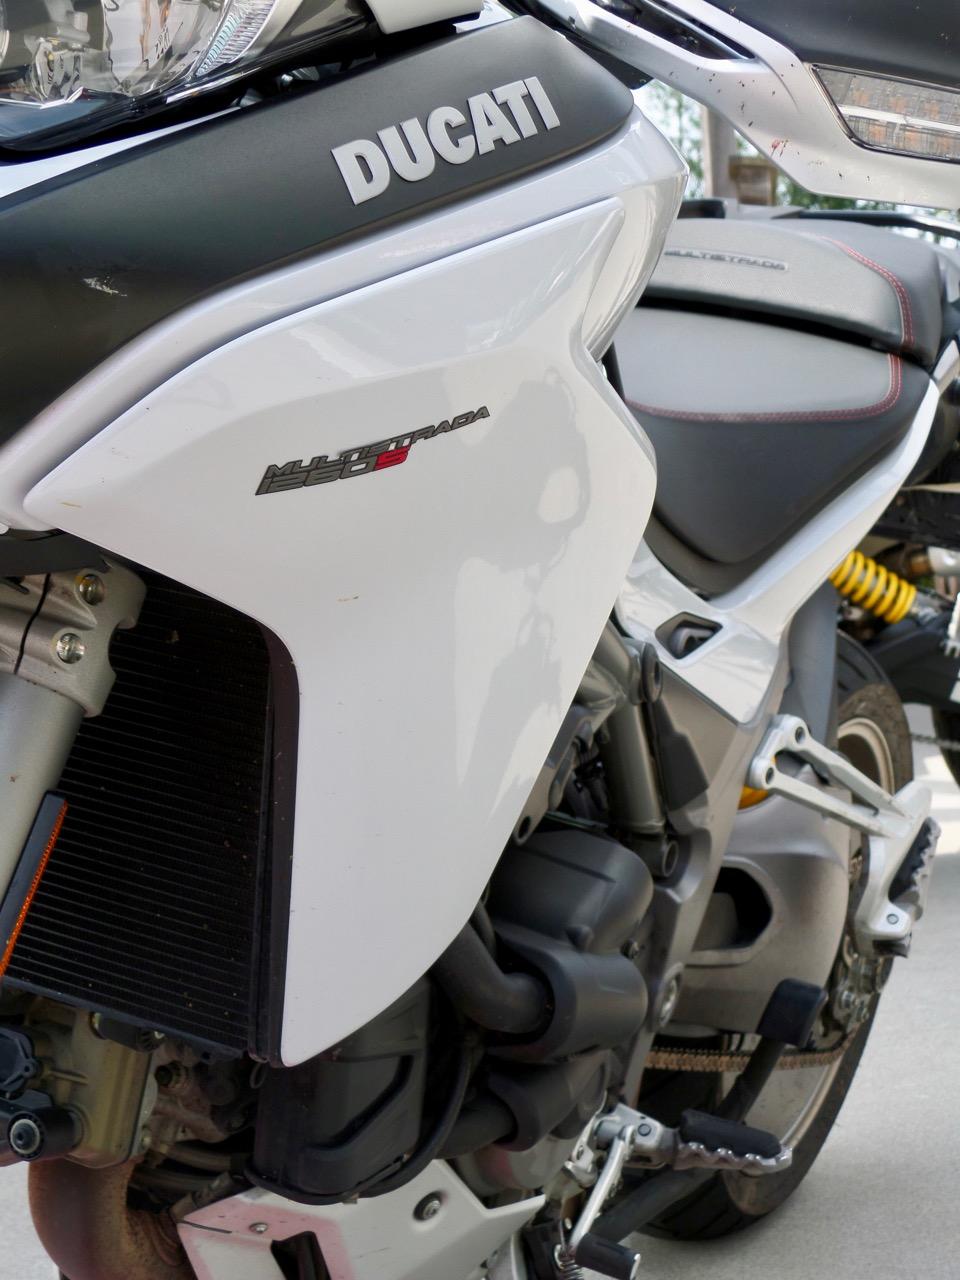 Ducati wit